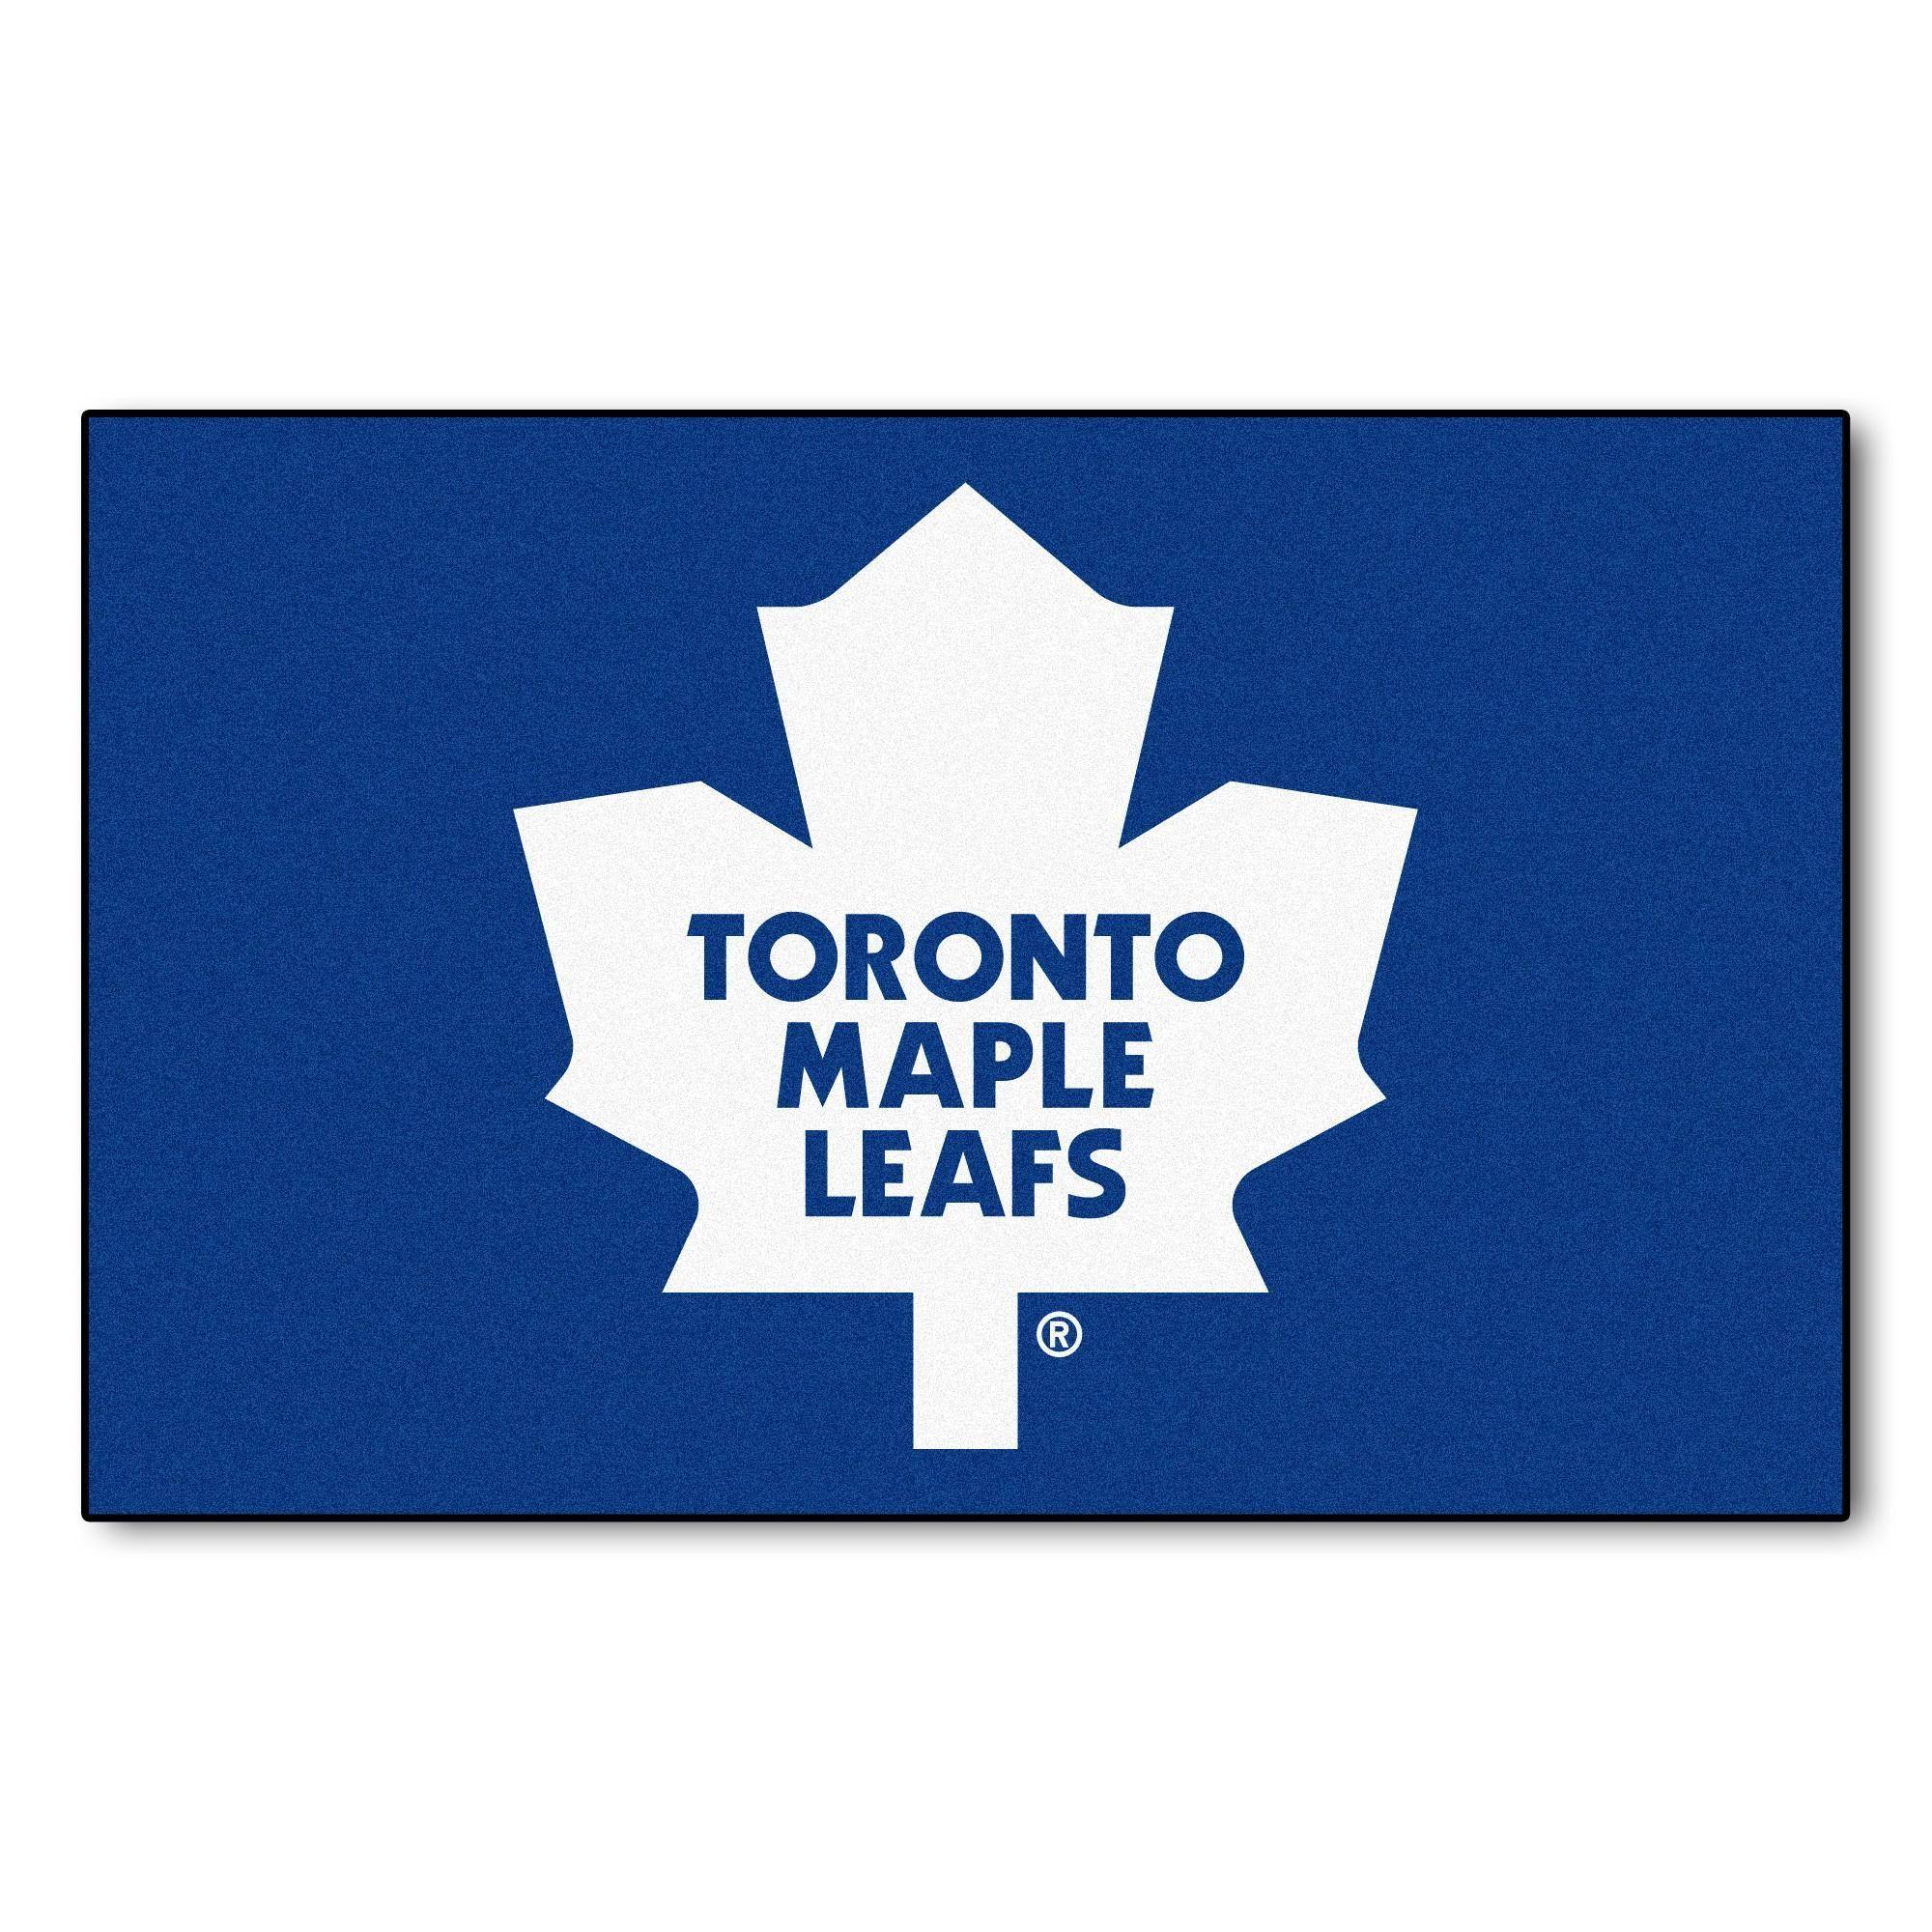 Toronto Maple Leafs Ulti-Mat 5x8  976c36677